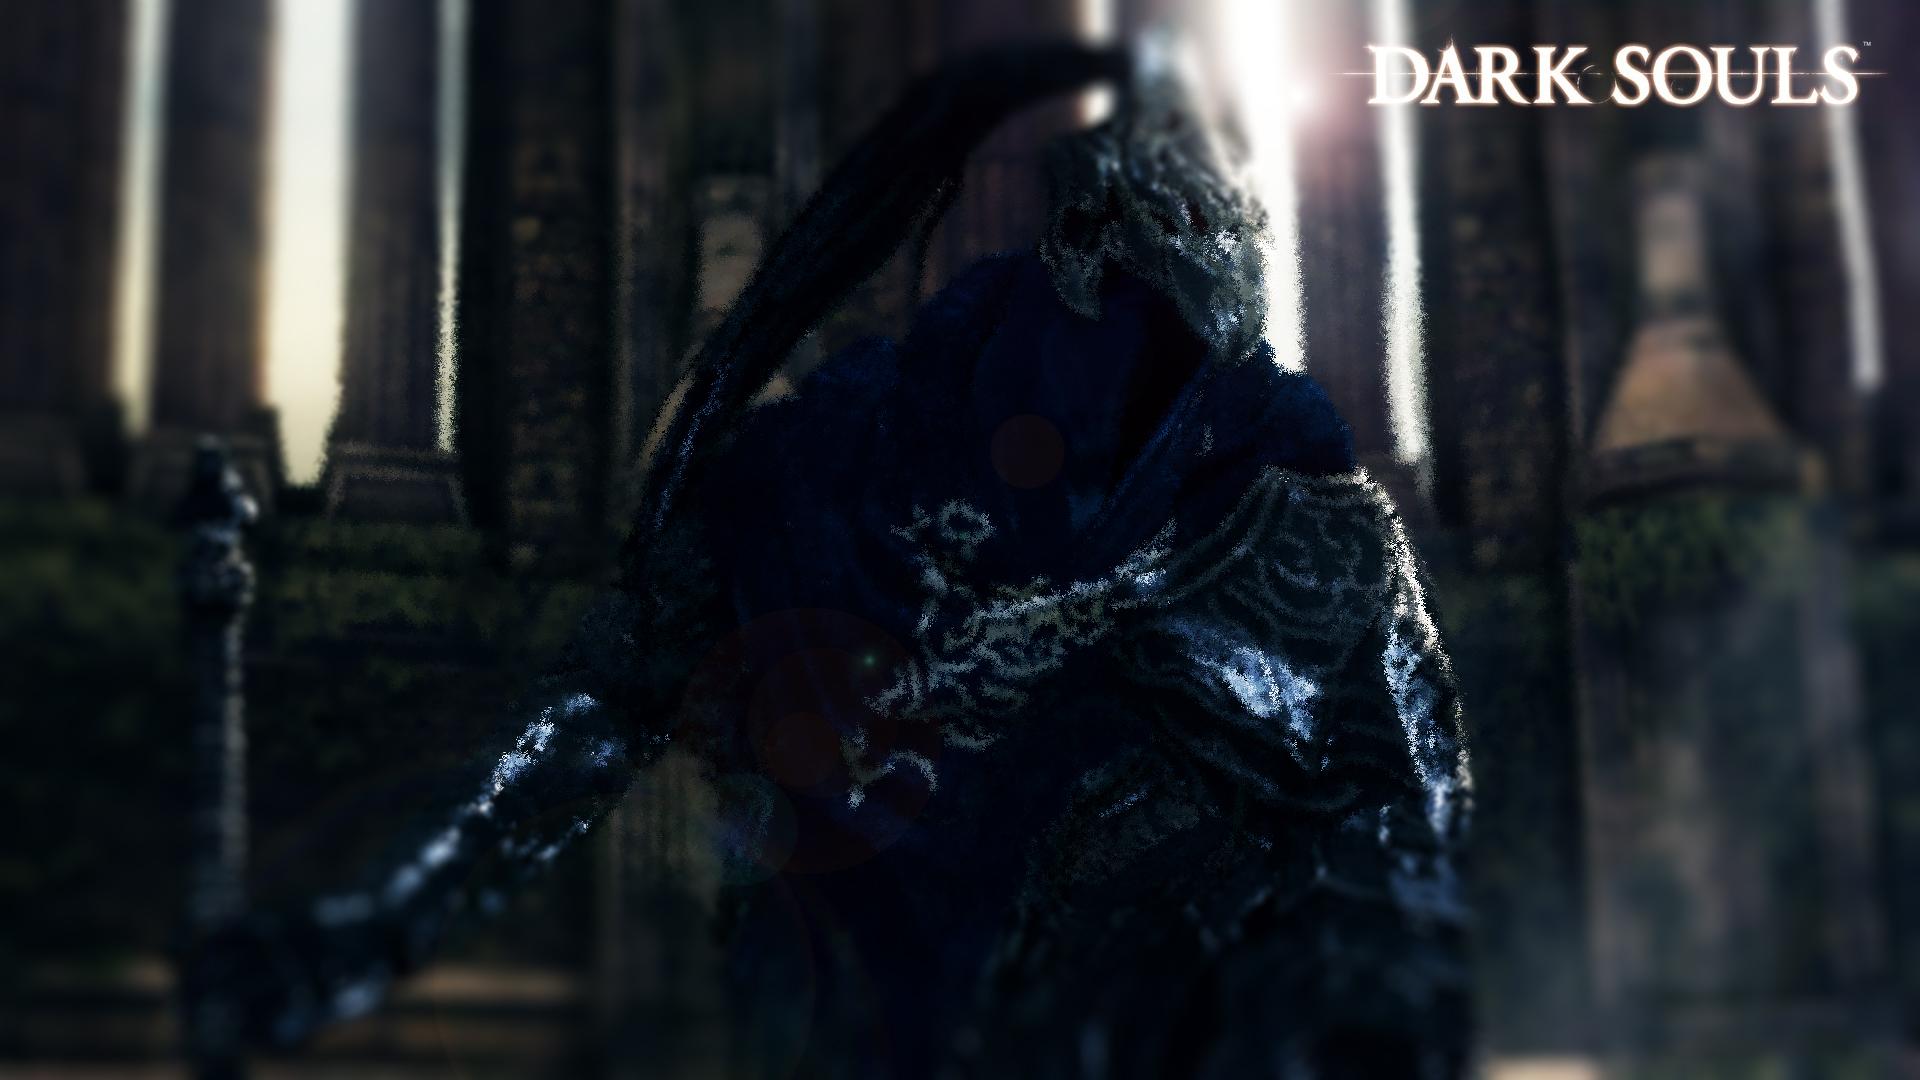 Dark Souls Artorias Of The Abyss By Dragoncrestpc On Deviantart